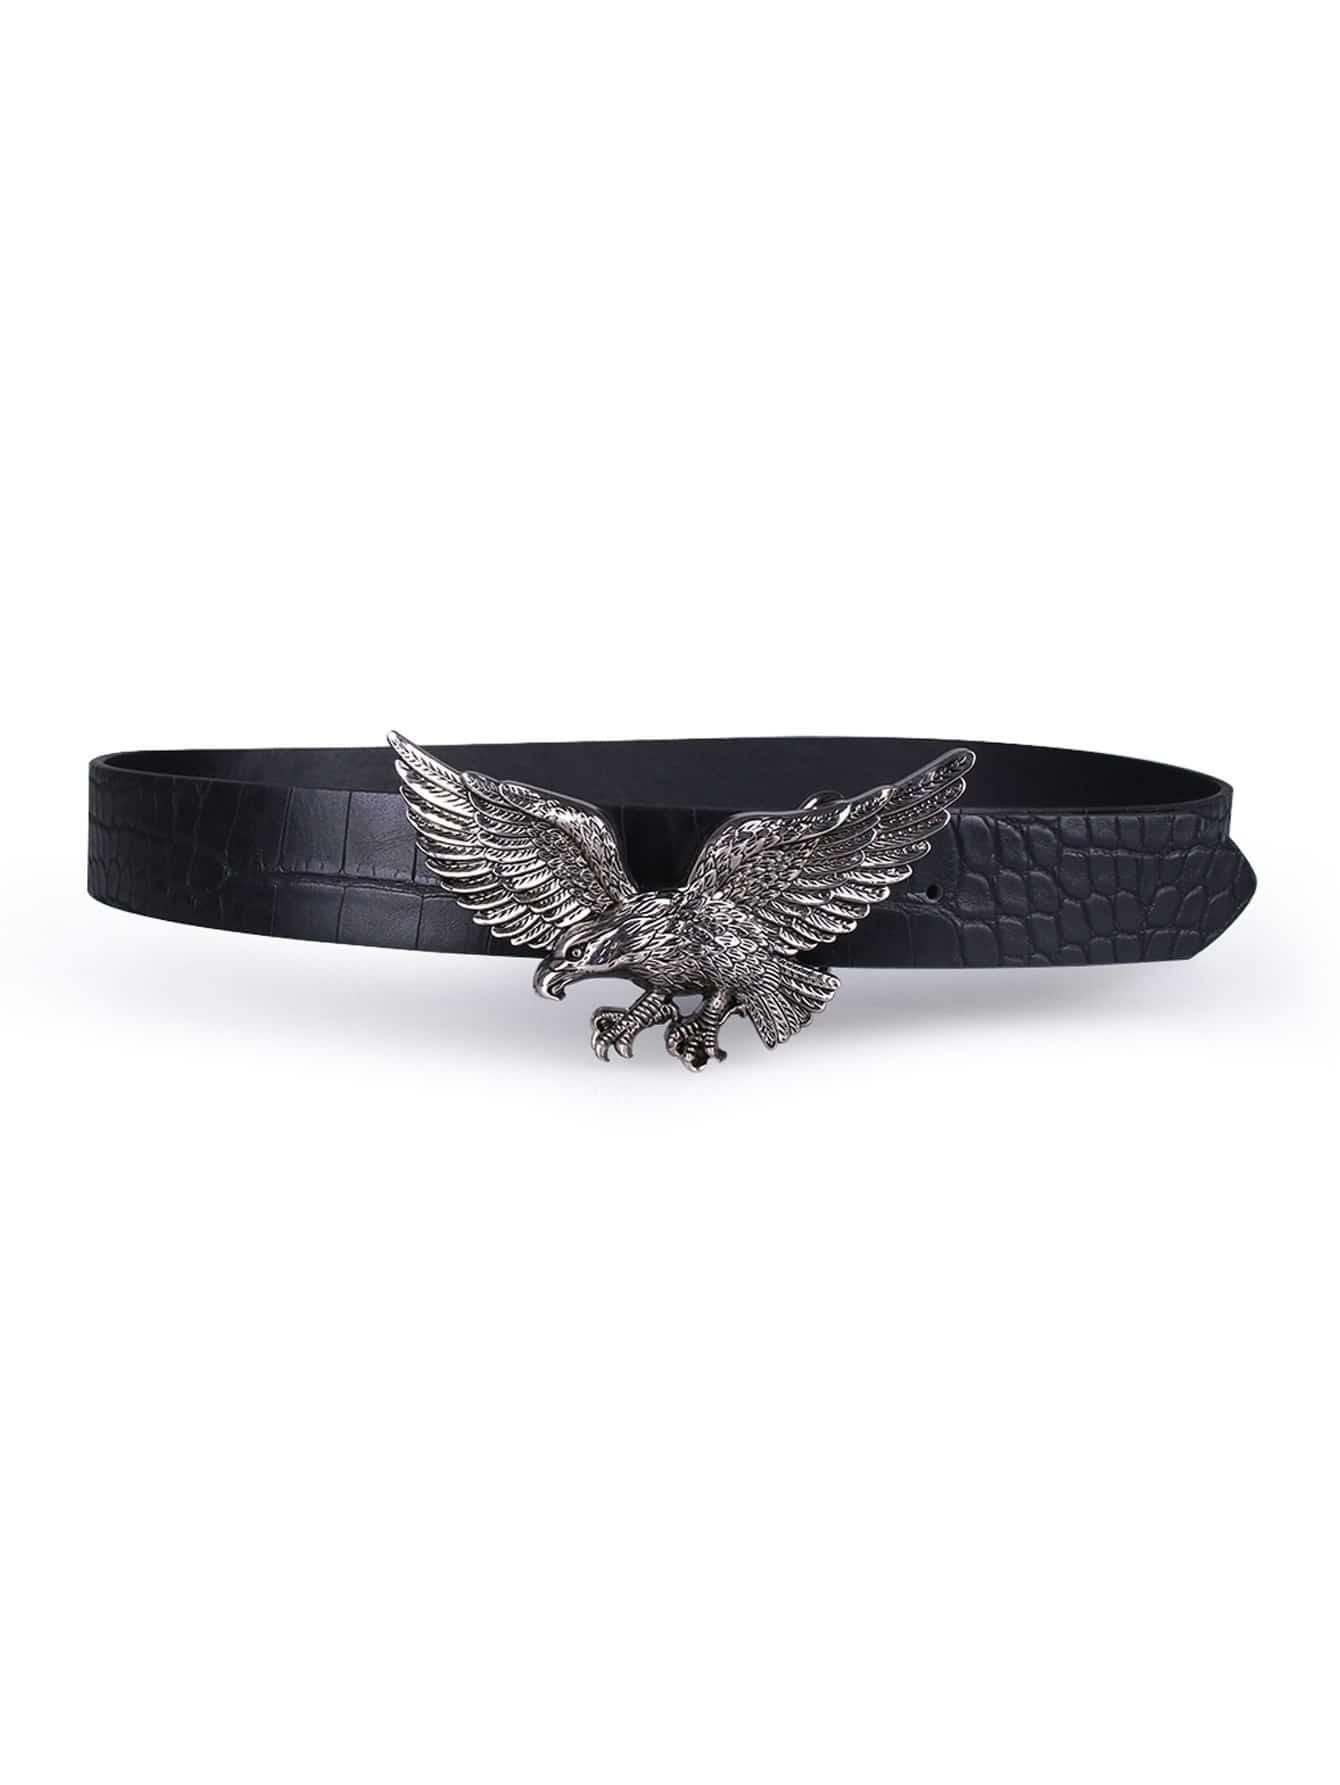 Eagle Shaped Buckle Belt